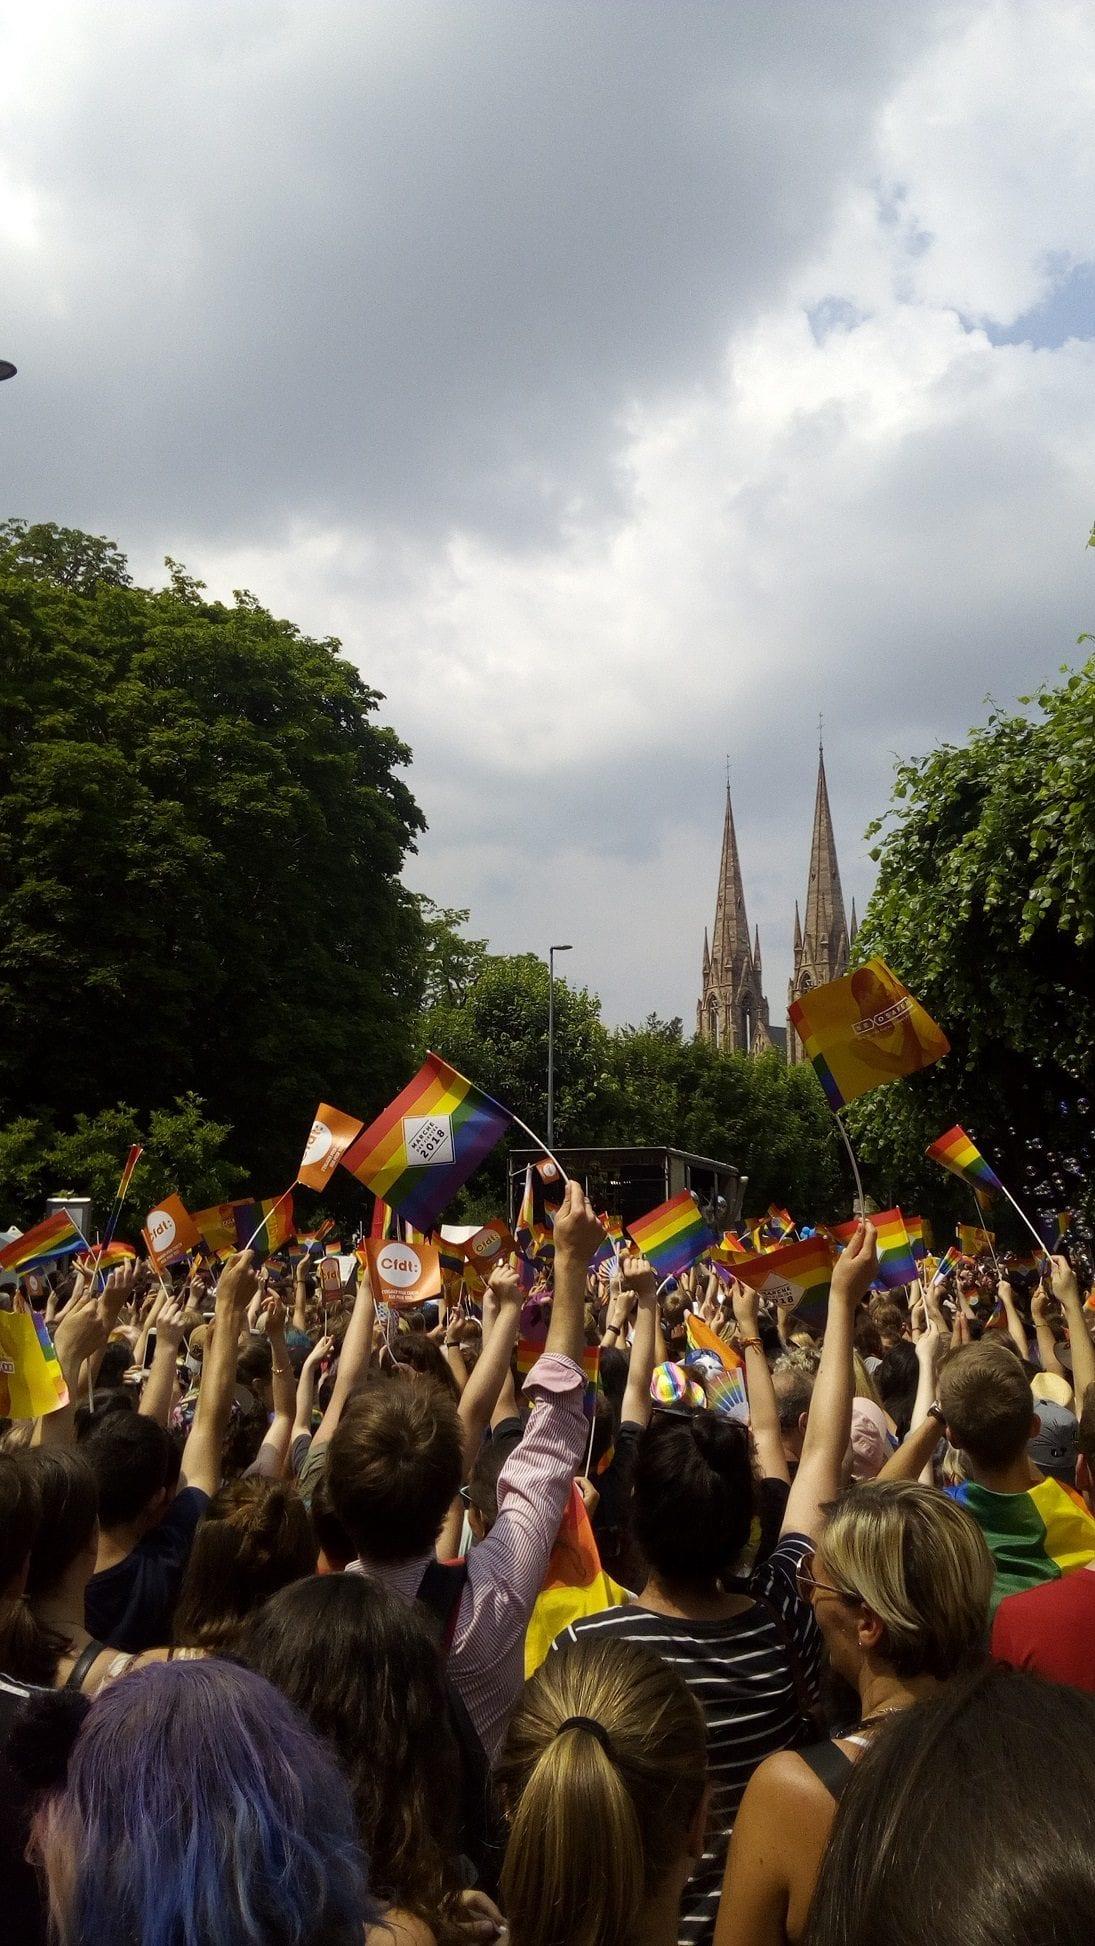 rencontres gays paris strasbourg